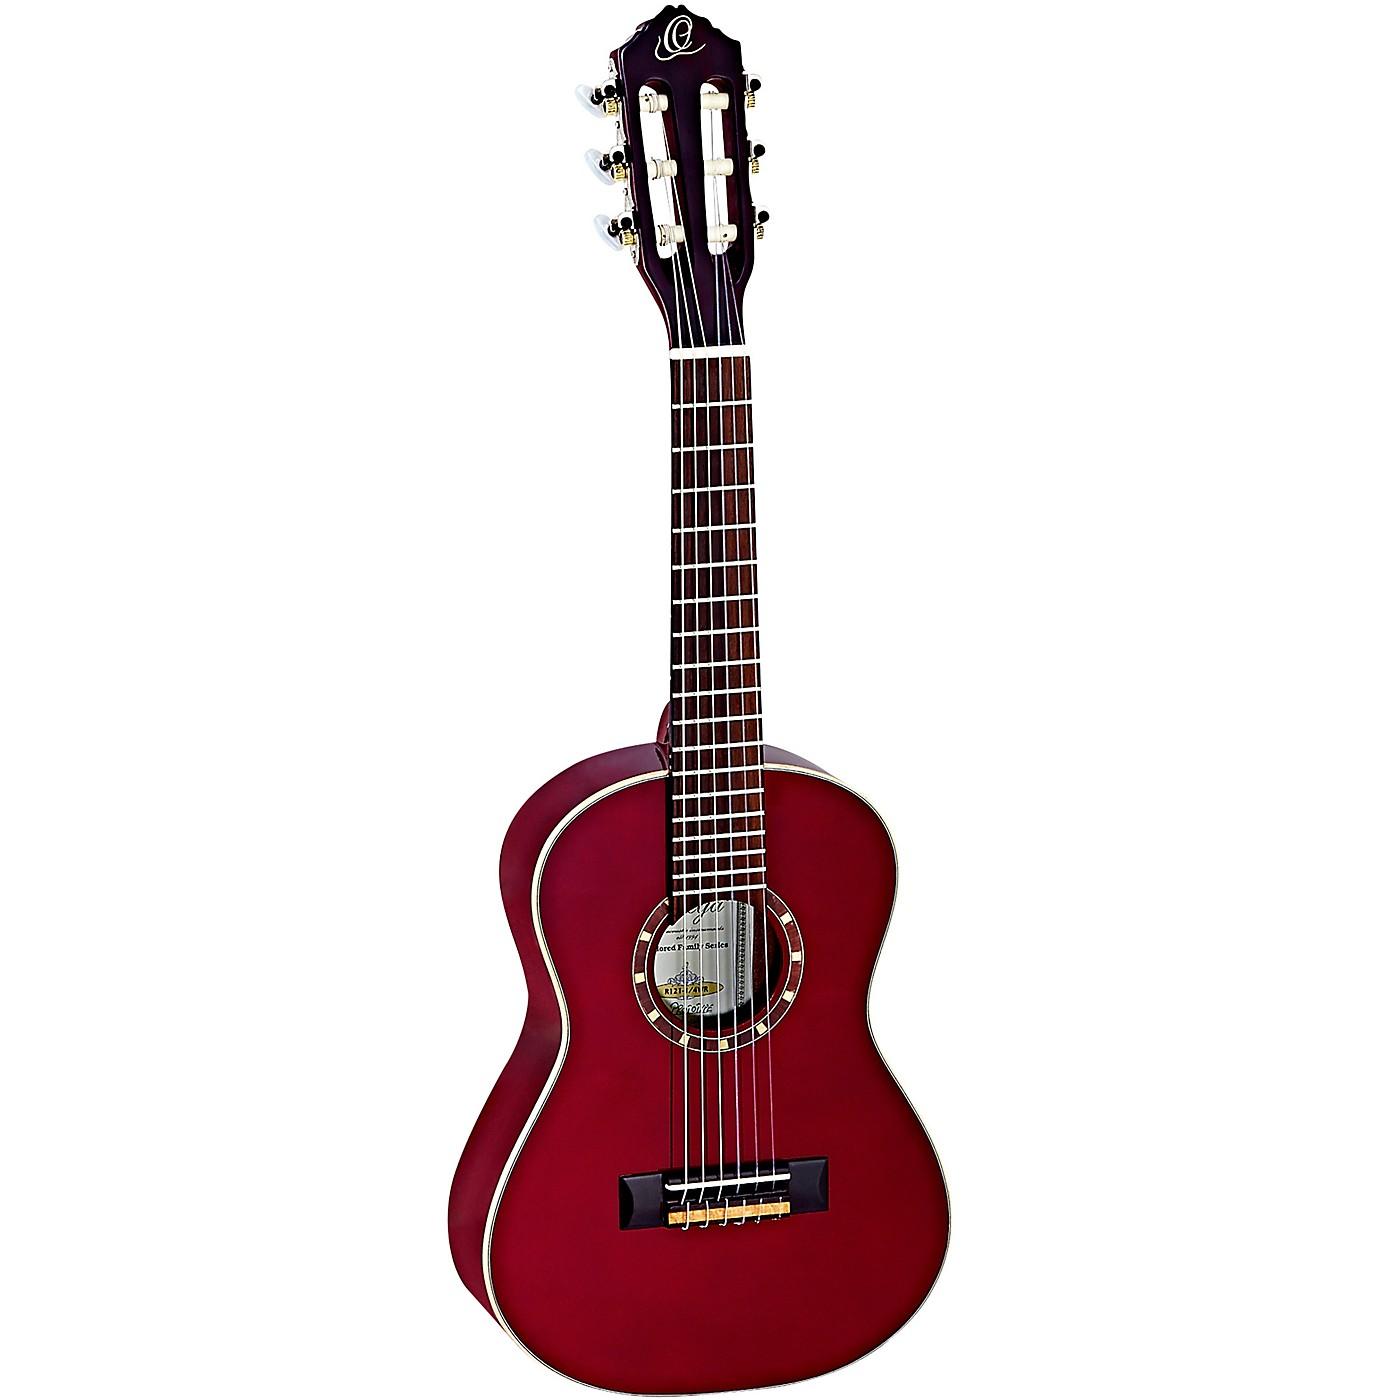 Ortega Family Series R121-1/4WR 1/4 Size Classical Guitar thumbnail